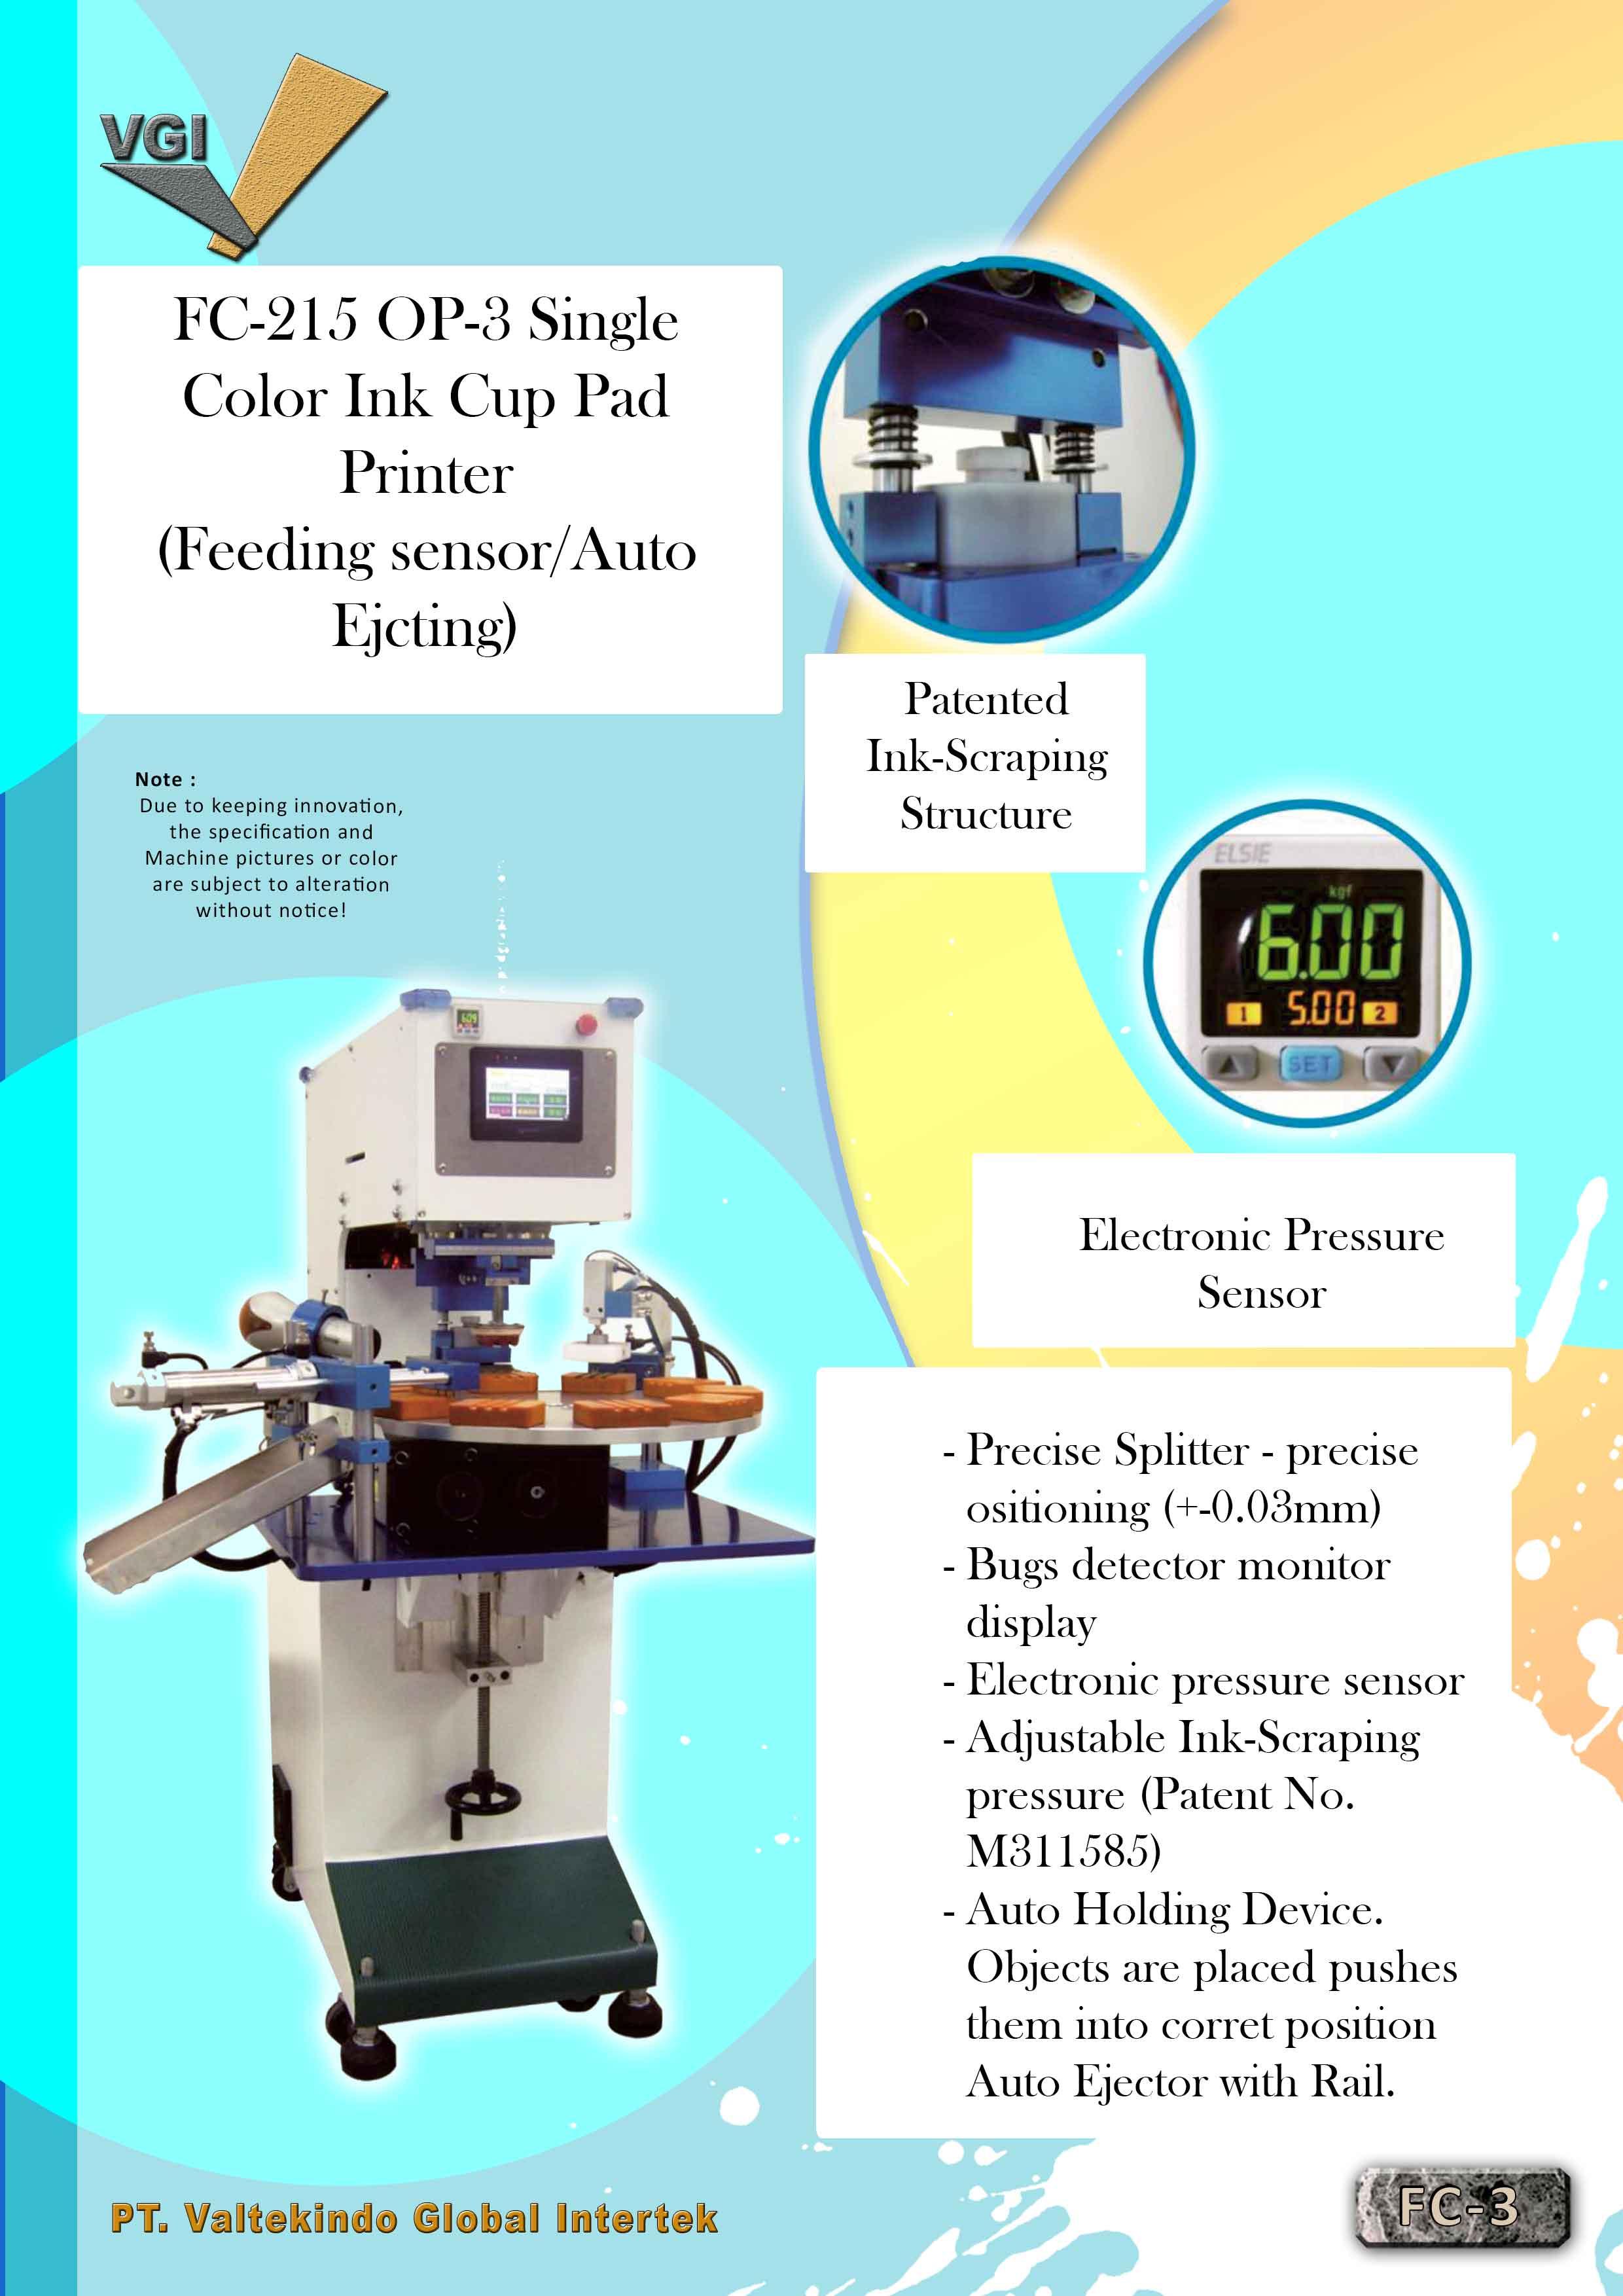 jual mesin, harga mesin, jual mesin bandung, distributor mesin, jual mesin karet, daur ulang karet, daur ulang plastik, mesin pertanian OP-3 Single Color Ink Cup Pad Printer (Feeding Sensor Auto Ejecting) OP-3 Single Color Ink Cup Pad Printer (Feeding Sensor Auto Ejecting)